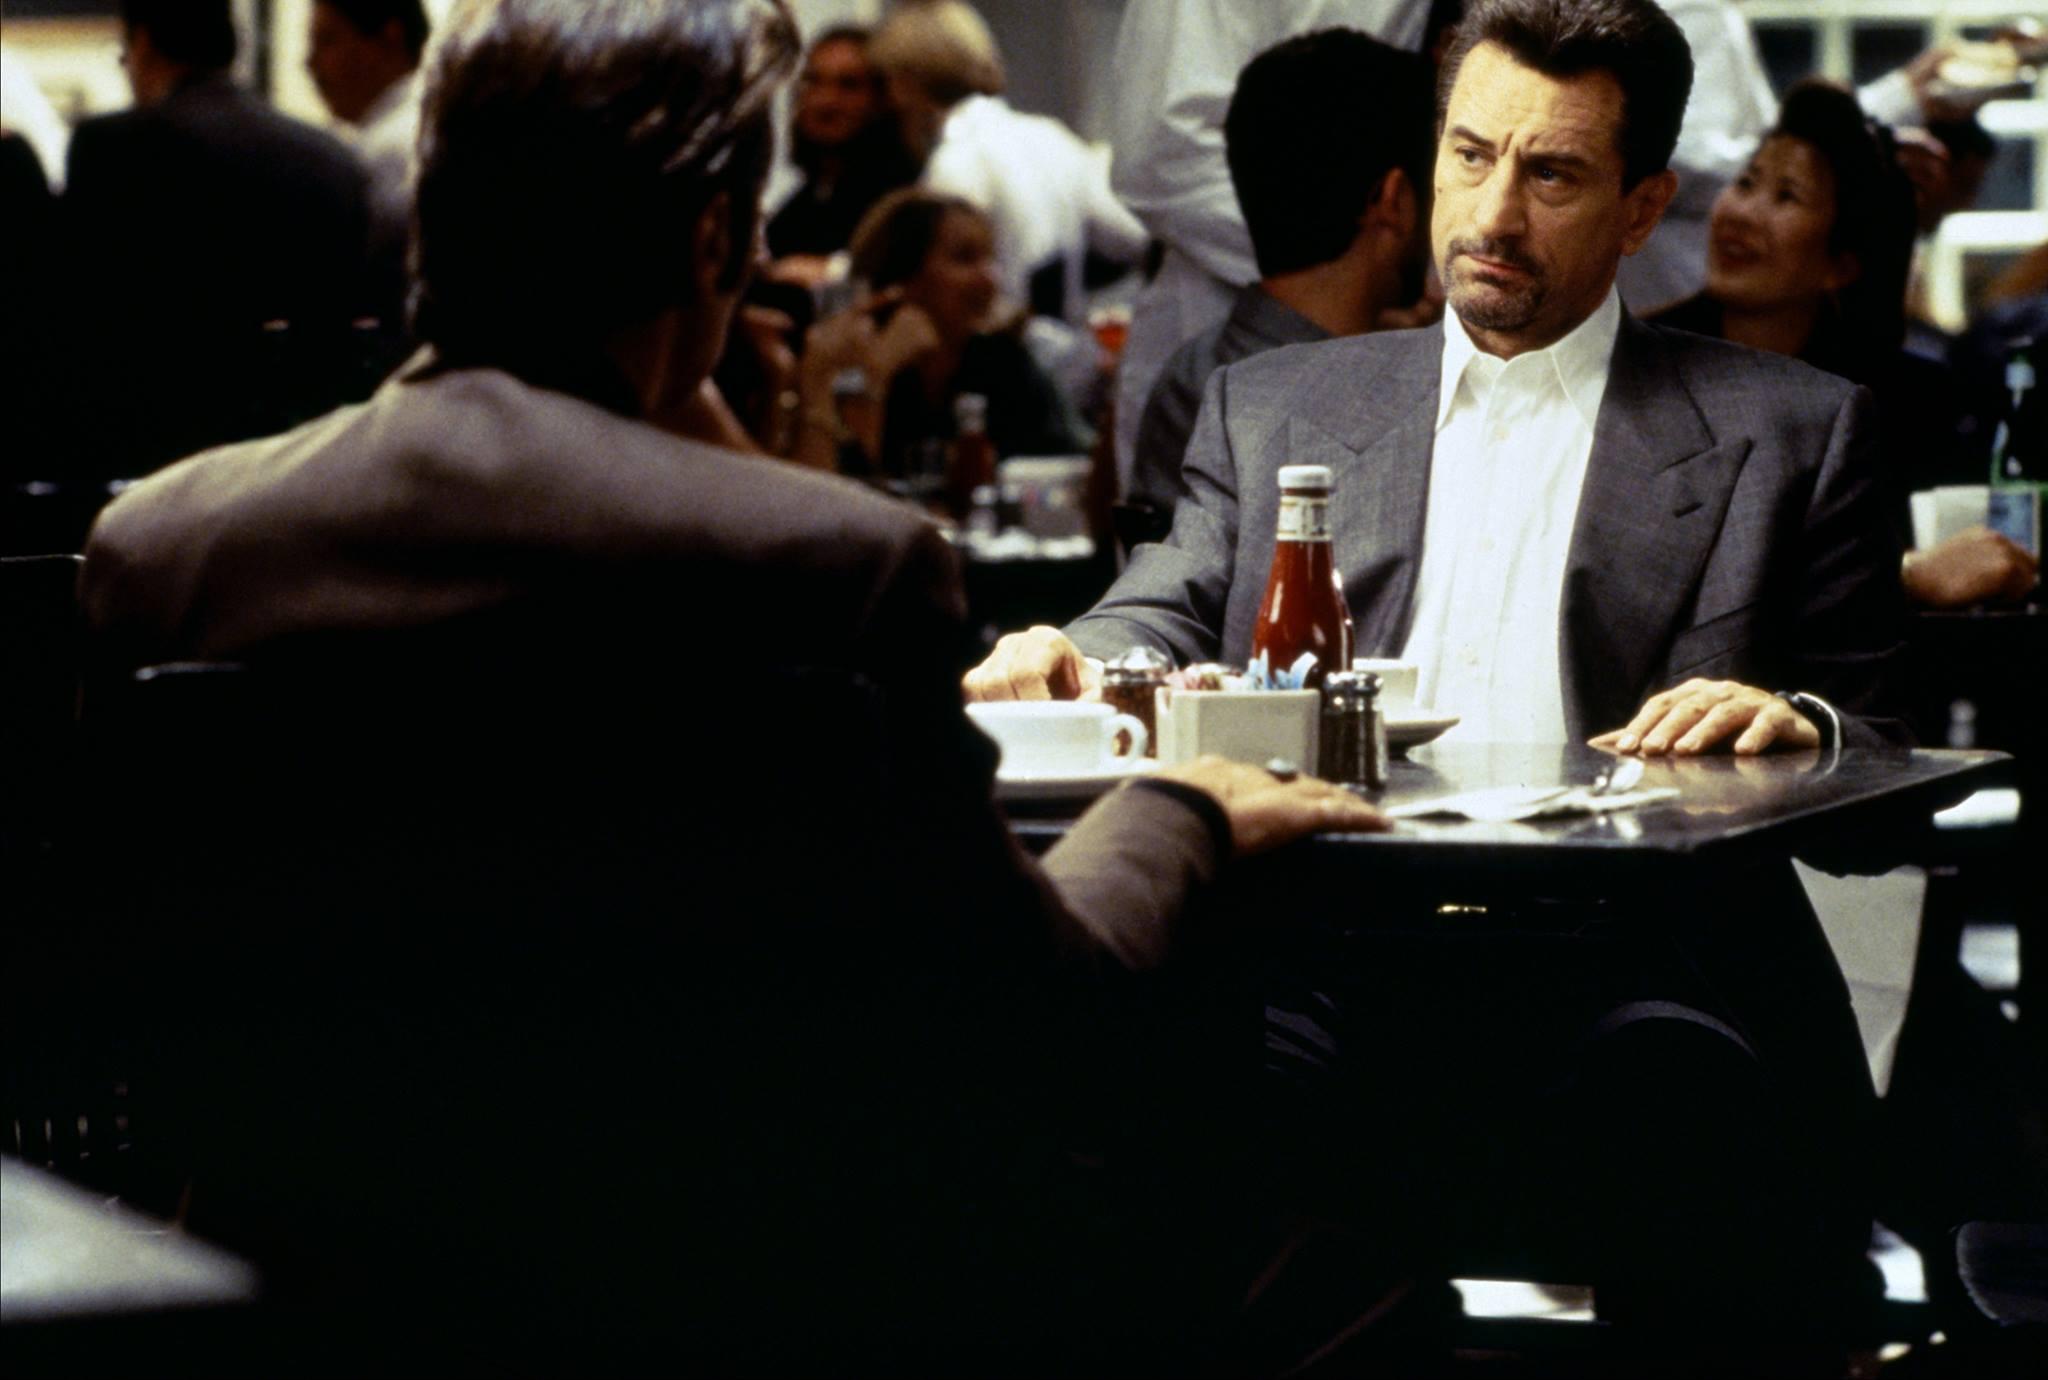 Heat - La sfida: una celebre scena con Al Pacino e Robert De Niro